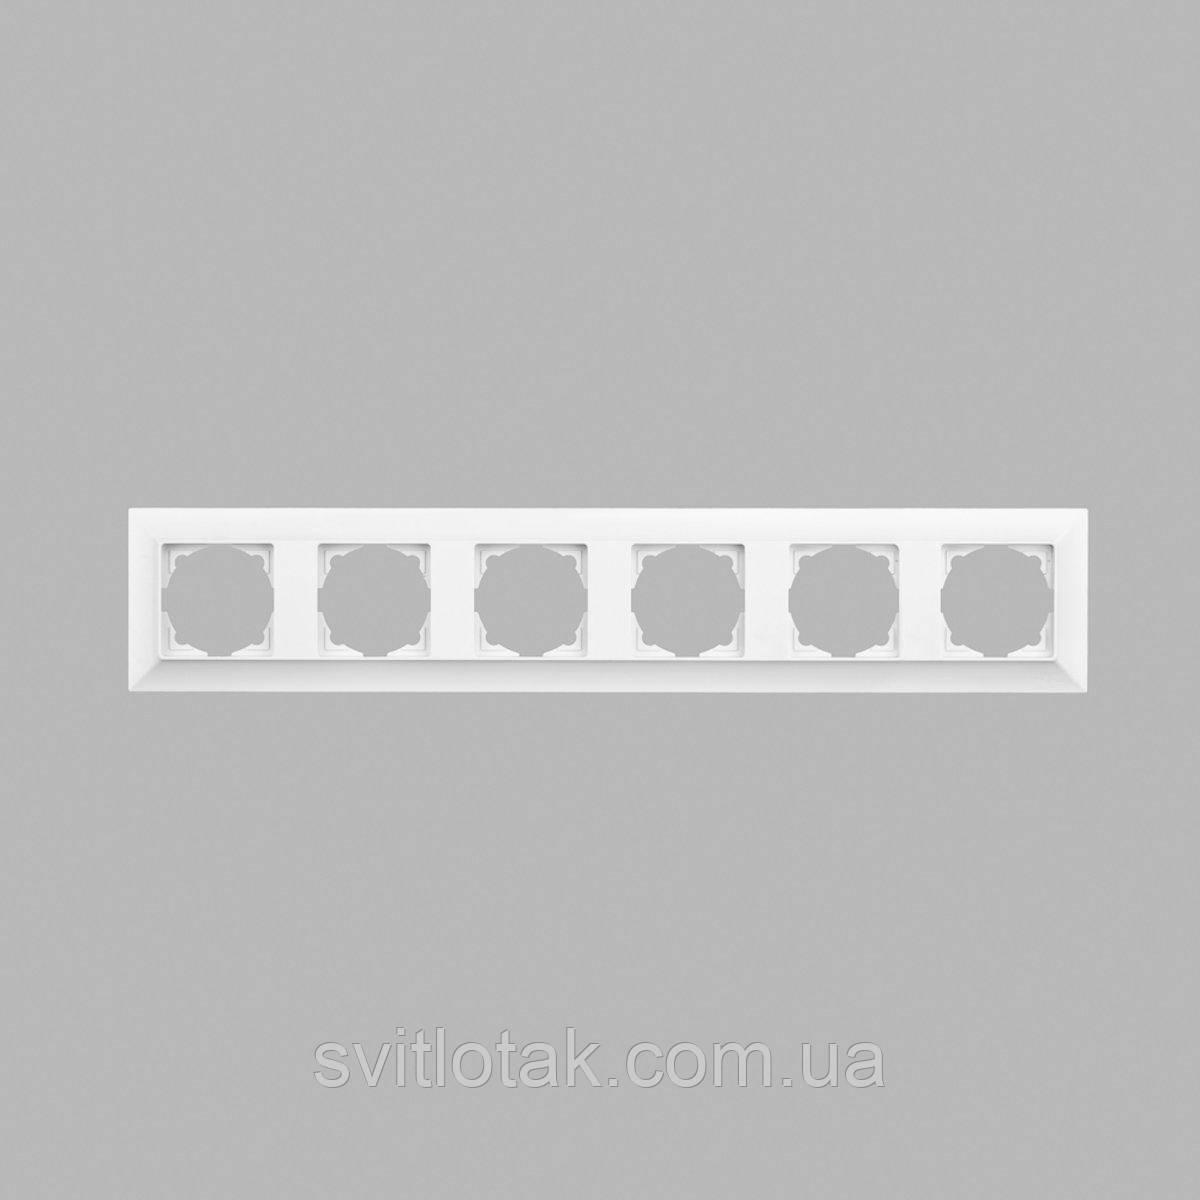 Neoline рамка 6-а, біла